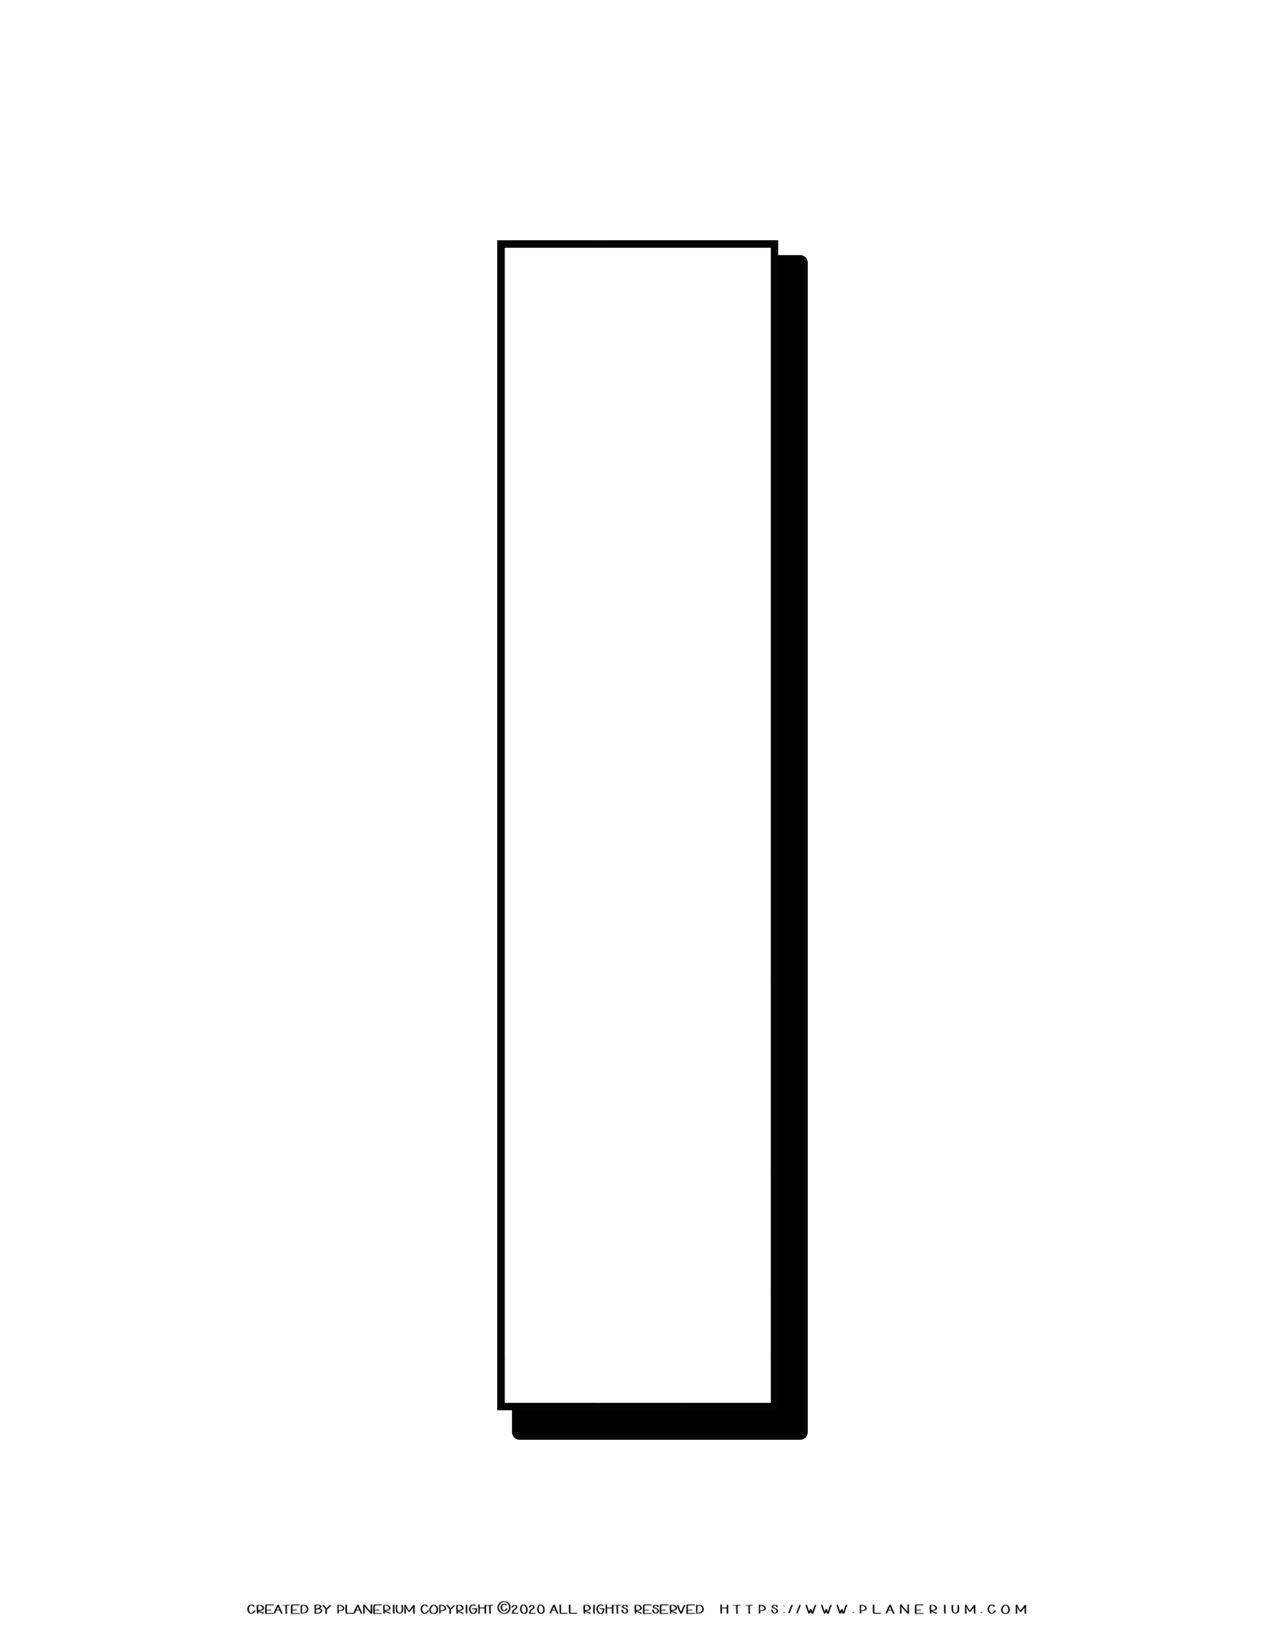 Alphabet Coloring Pages - English Letters - Capital I | Planerium